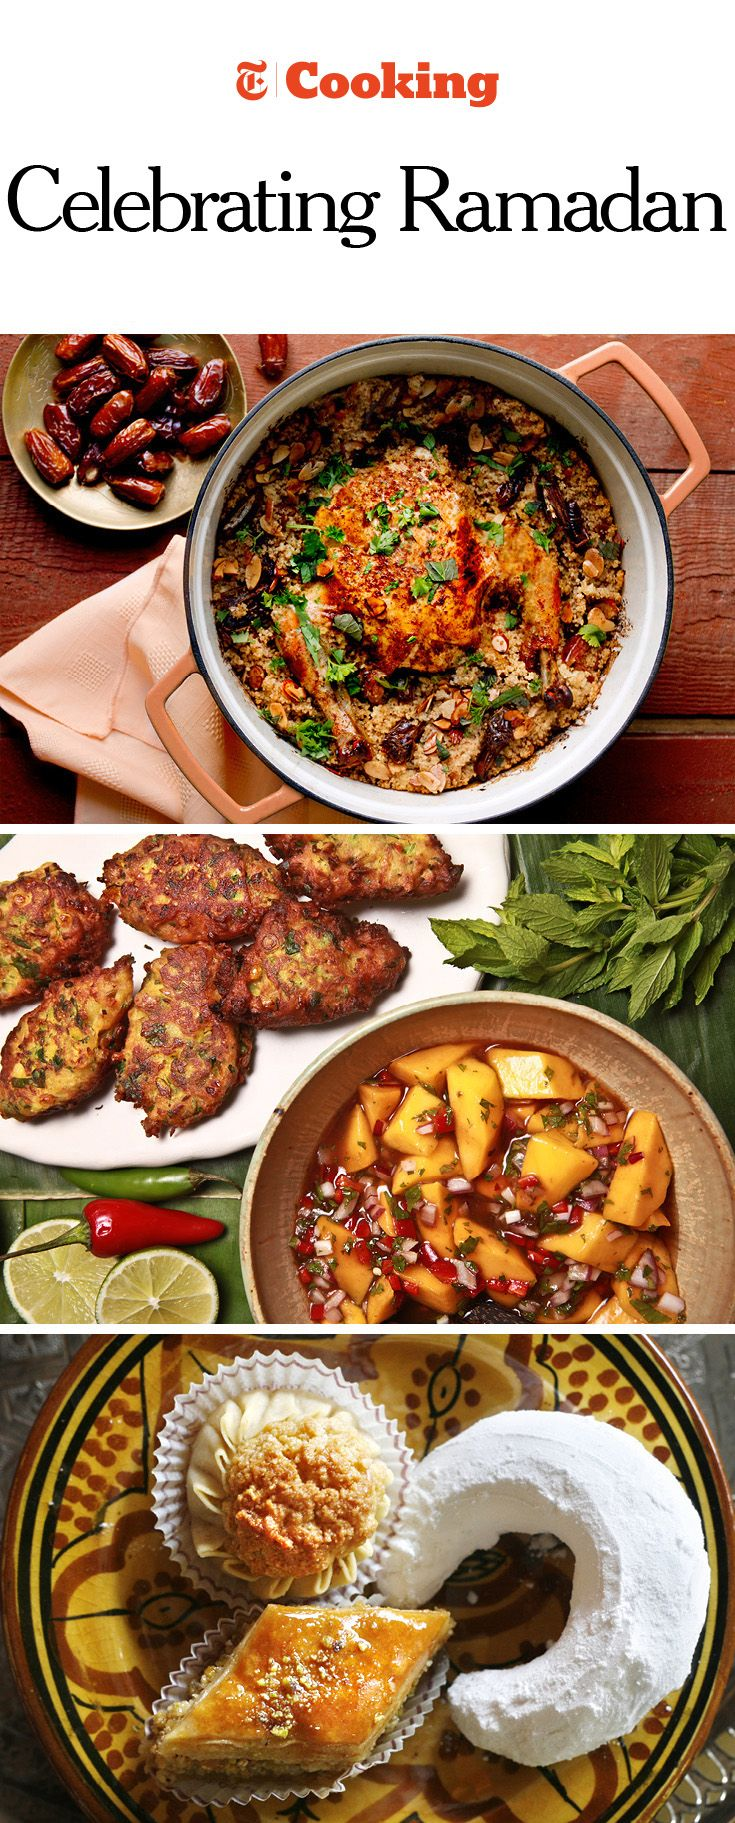 Beautiful Ramadan Eid Al-Fitr Food - 0a5a241db4a173a422837278ee4044ec--eid-recipes-ramadan-recipes  2018_706425 .jpg